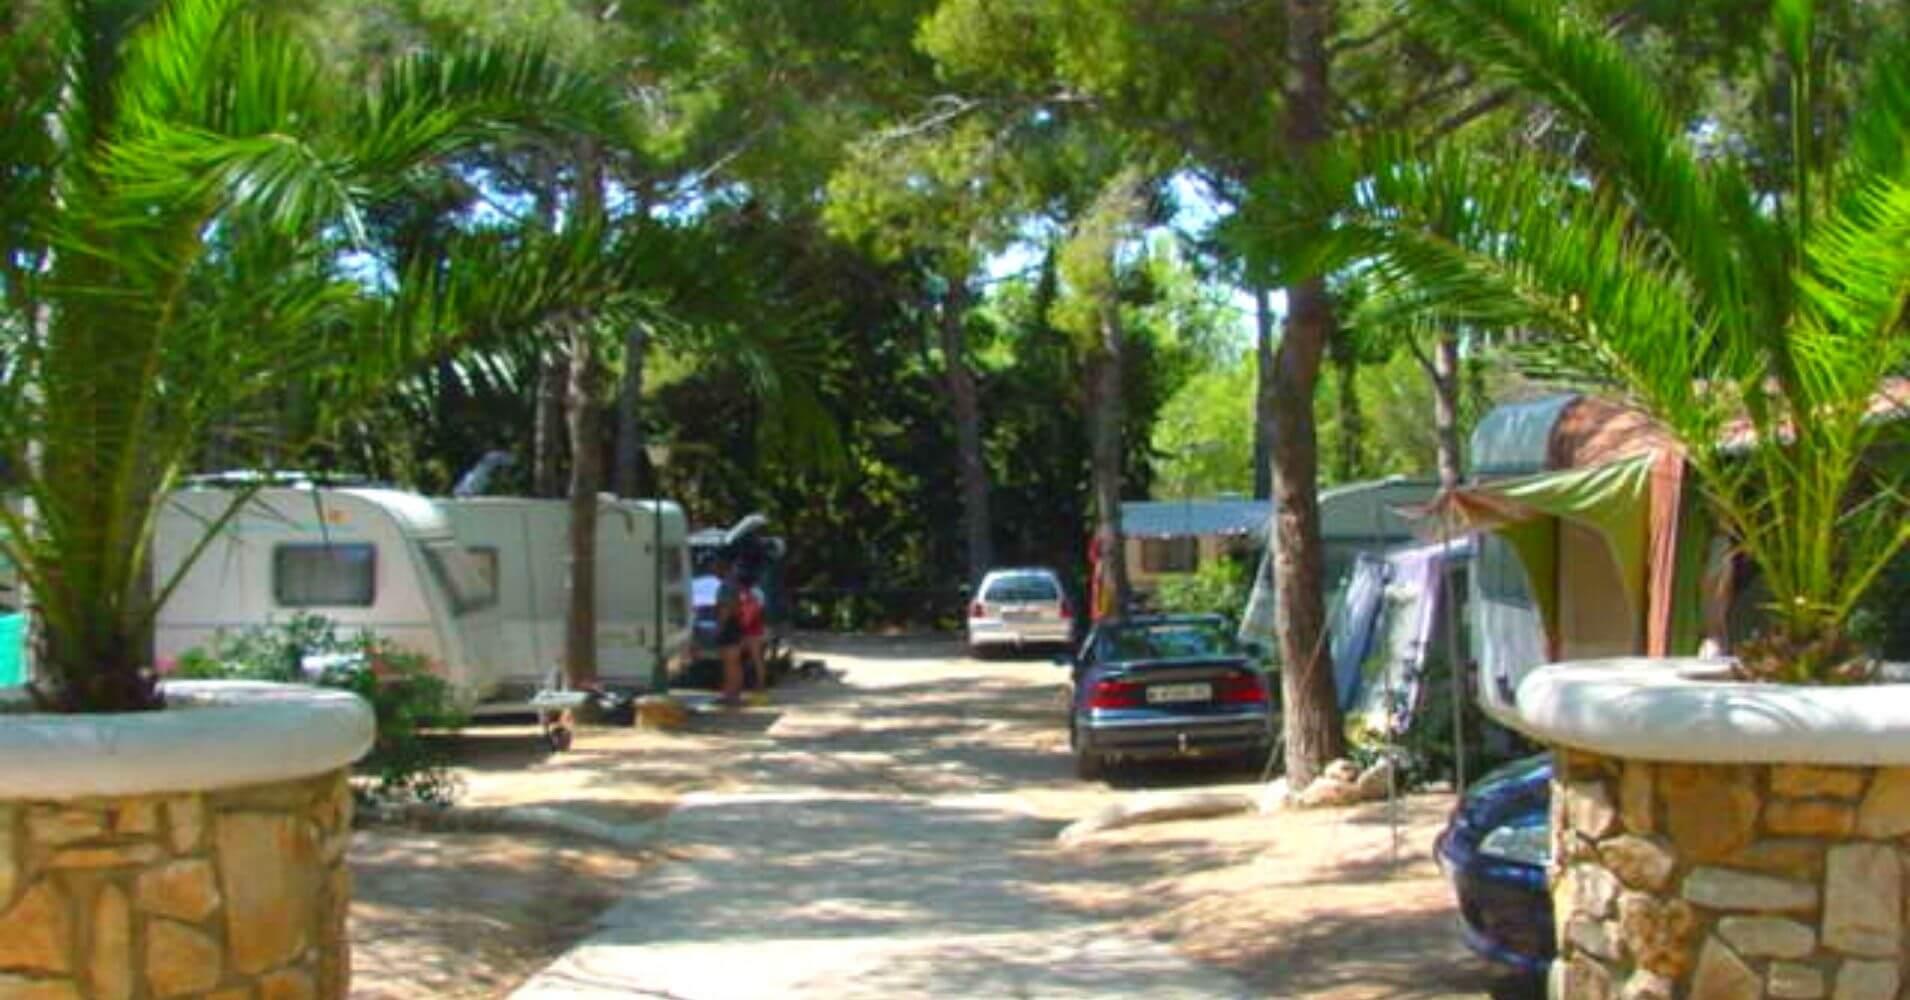 Parcelas del Camping Playa Barà Resort Spa. Rodá de Barà. Tarragona. Cataluña.